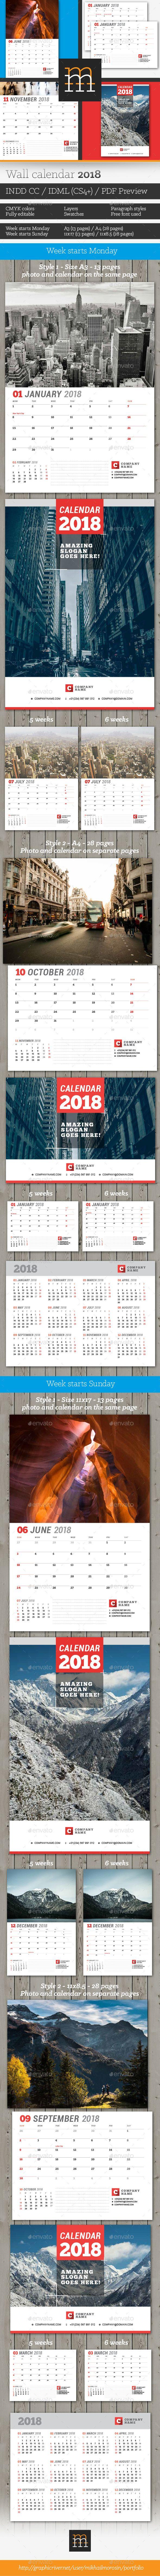 Wall Calendar 2018 Template InDesign INDD | Calendar Templates ...